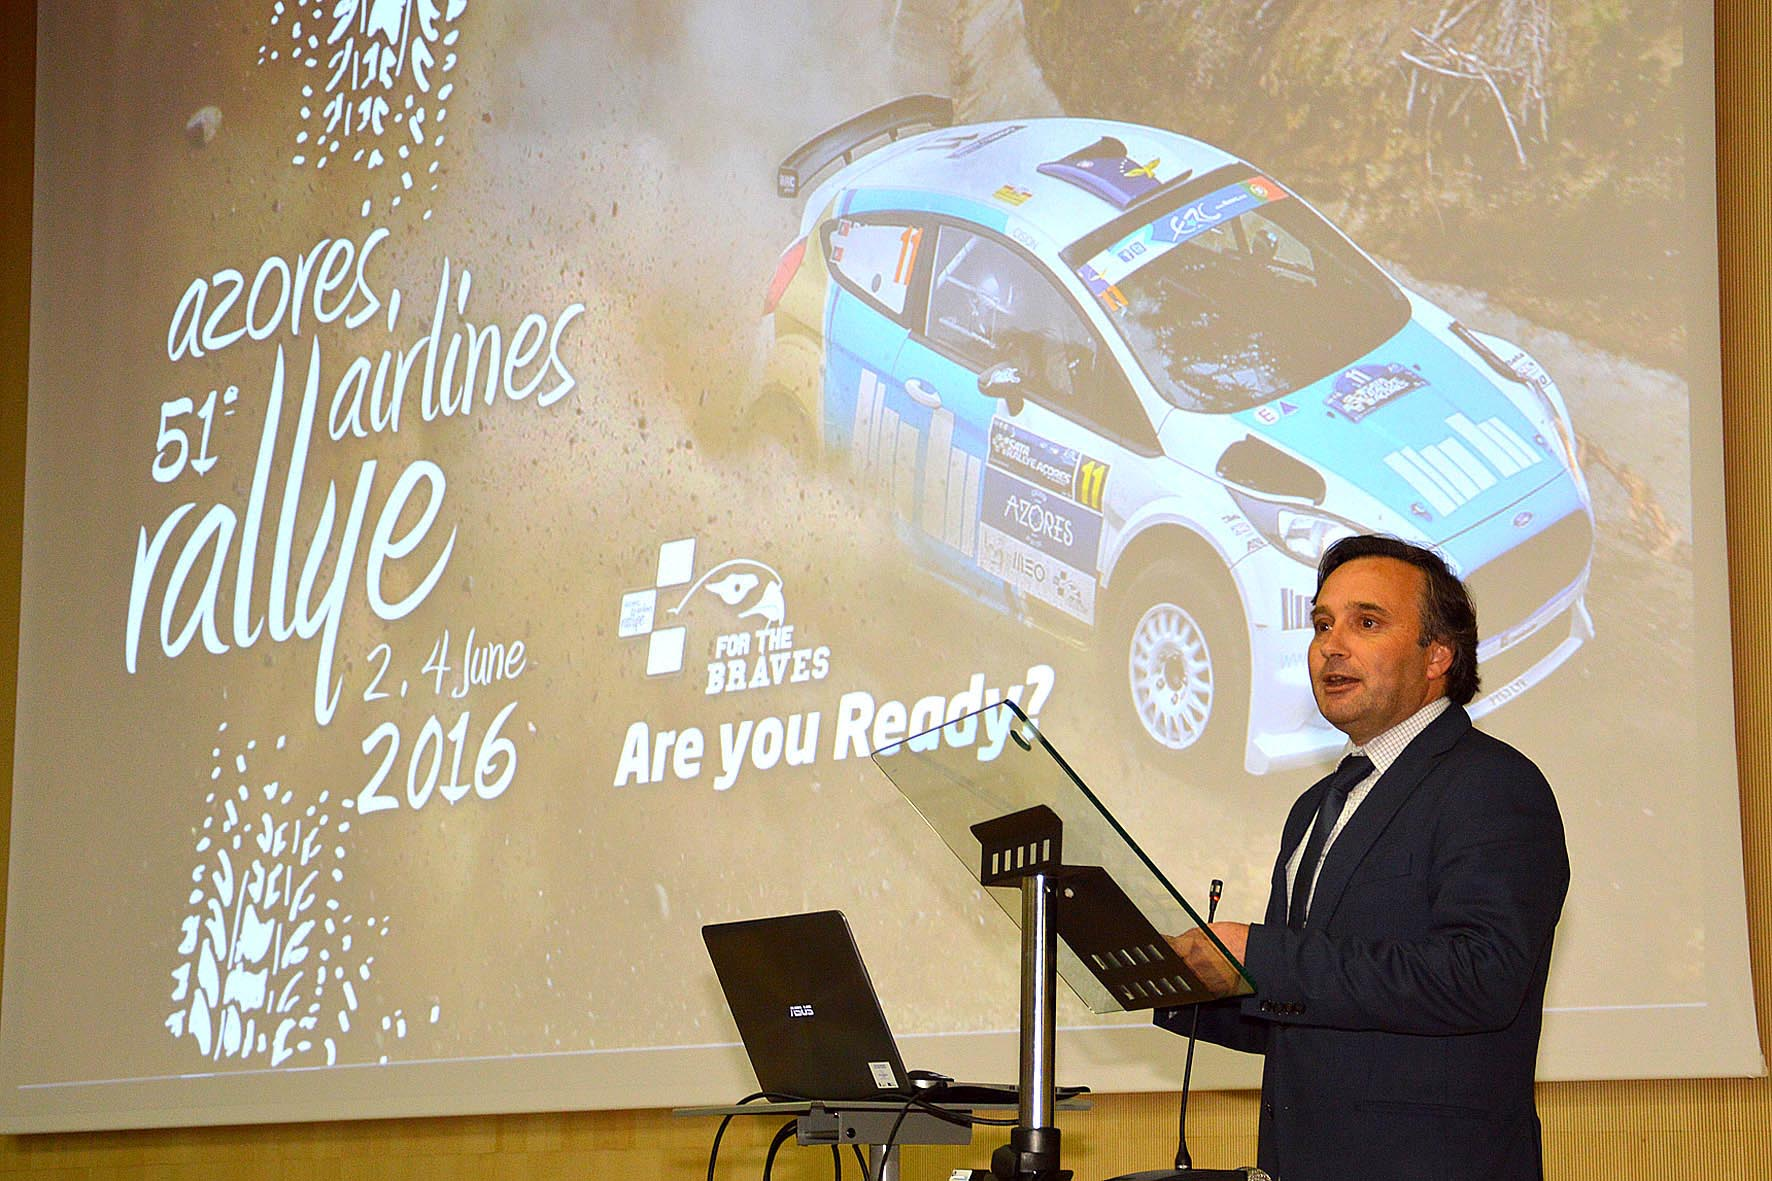 "Azores Airlines Rallye demonstra capacidade dos Açores para ""organizar eventos à escala global"", afirma Vítor Fraga"